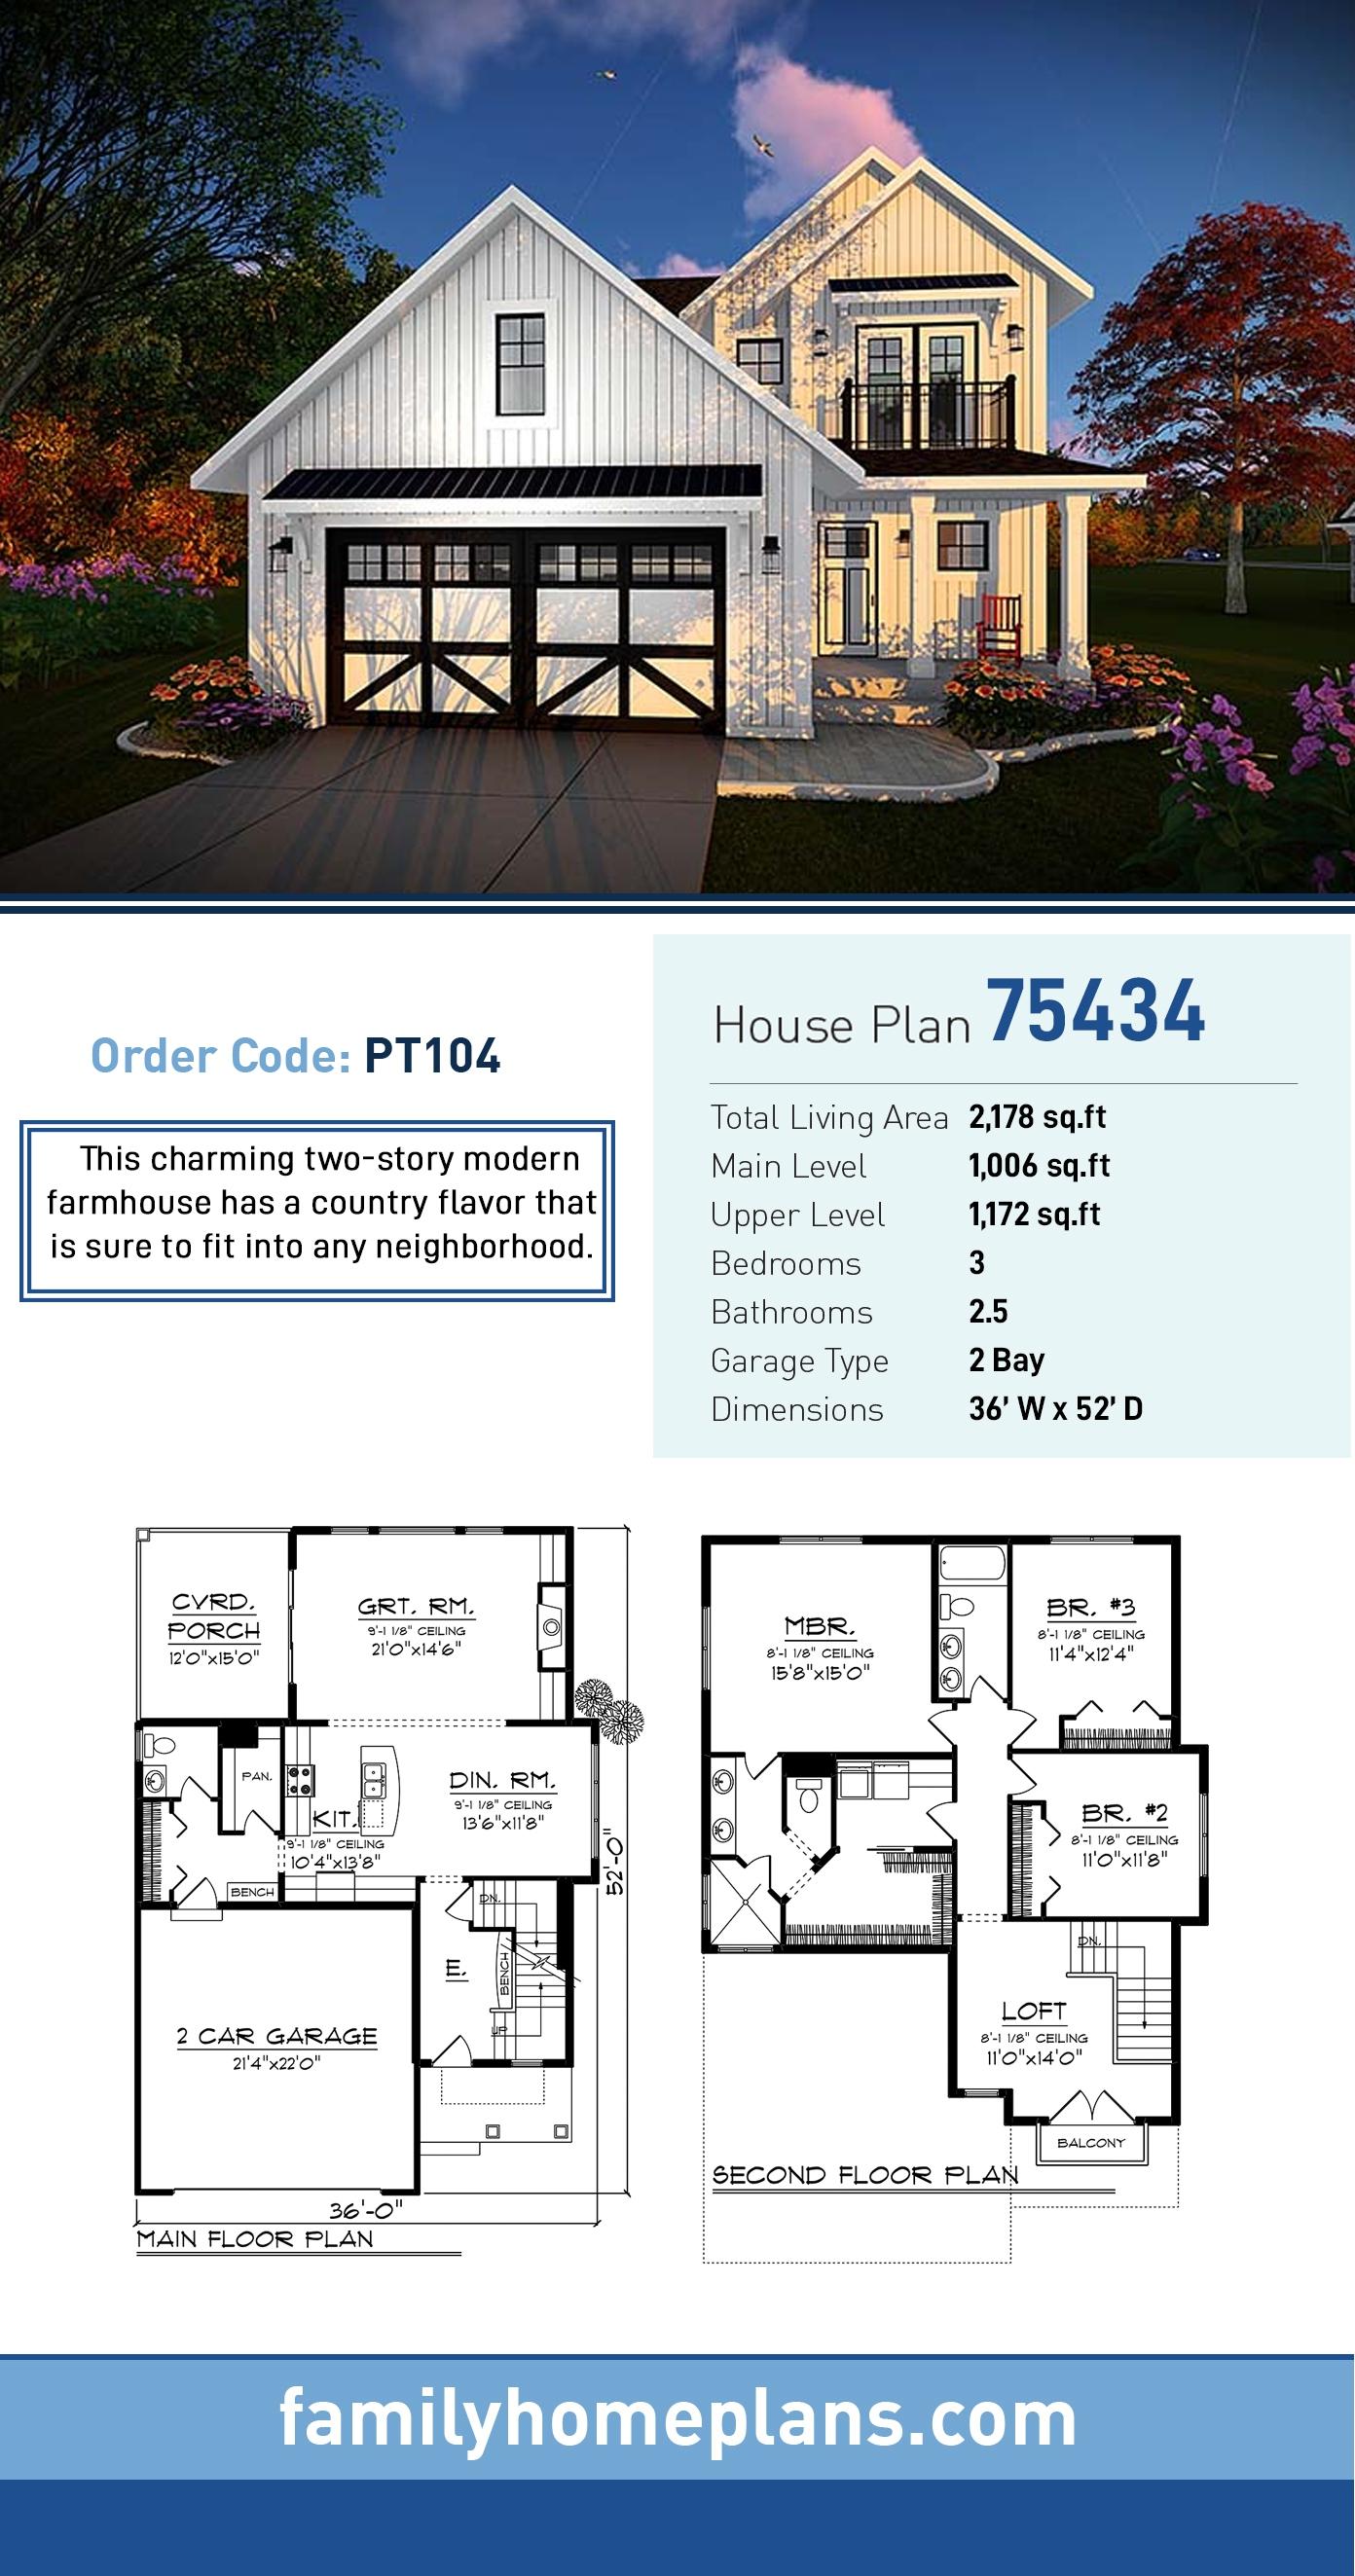 Cottage , Craftsman , Farmhouse House Plan 75434 with 3 Beds, 3 Baths, 2 Car Garage